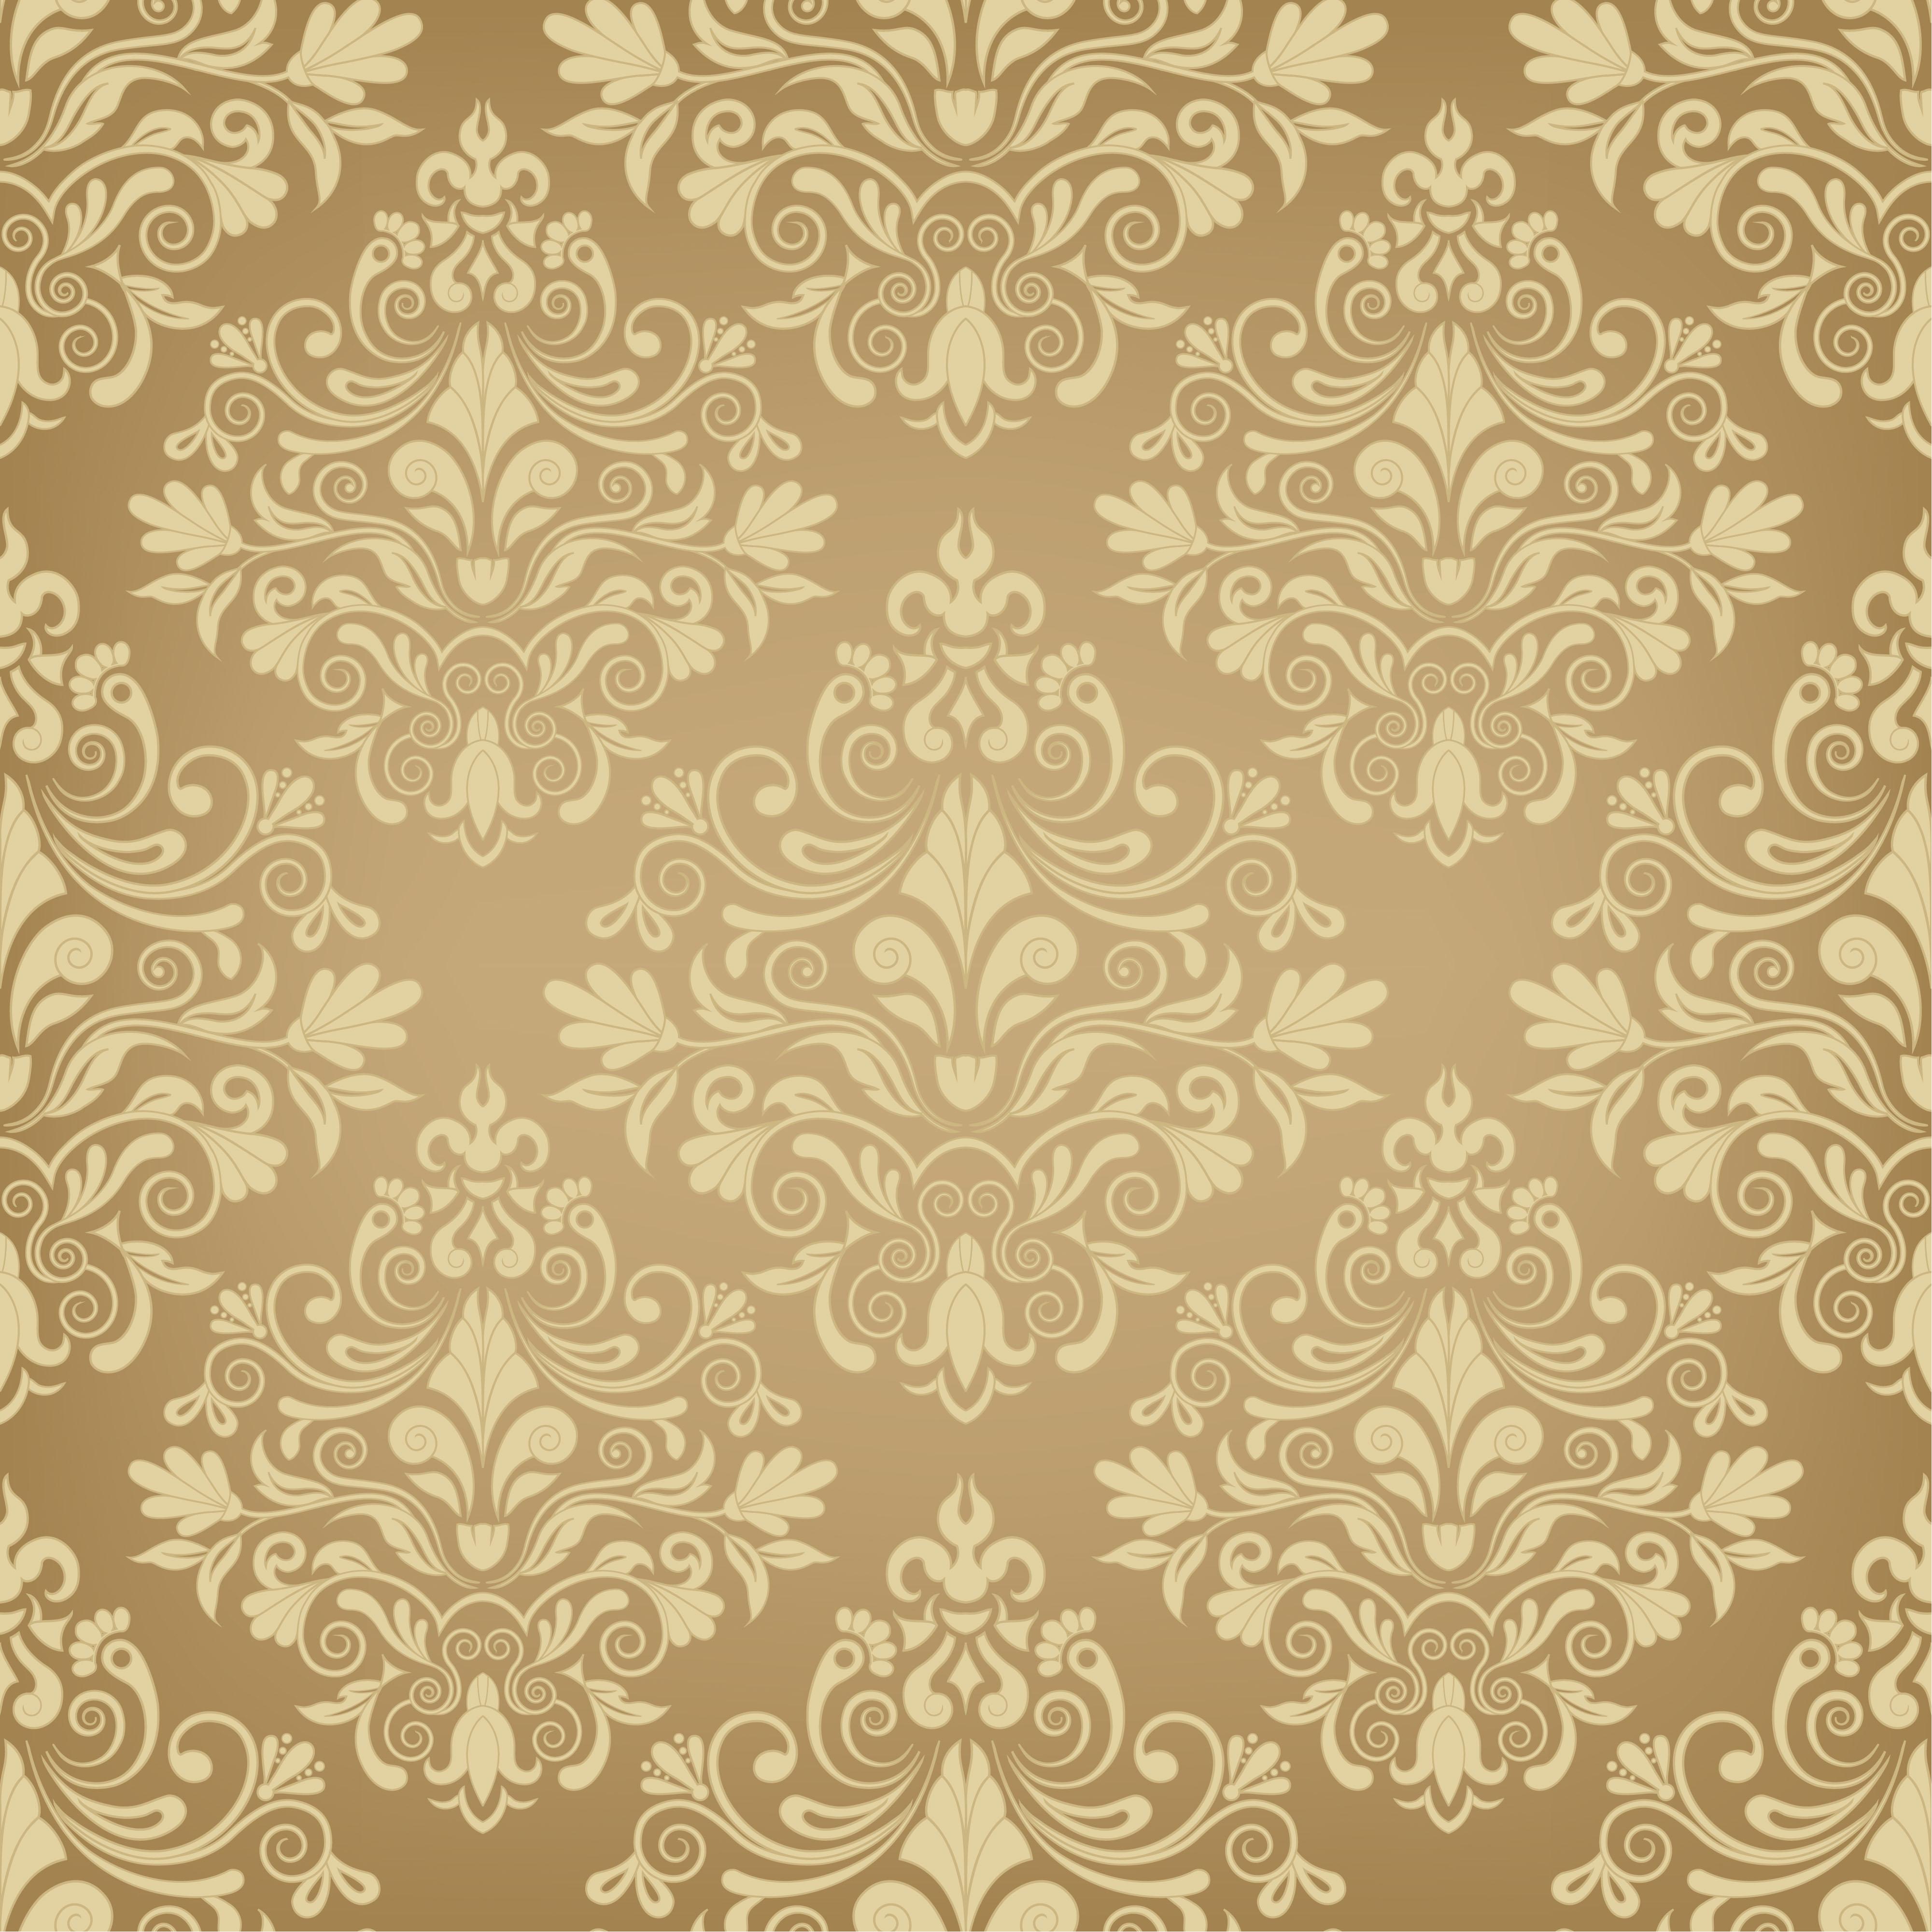 Azulejo Adesivo : AZ140 Arabesco Design Elo7 #A68826 4001 4001